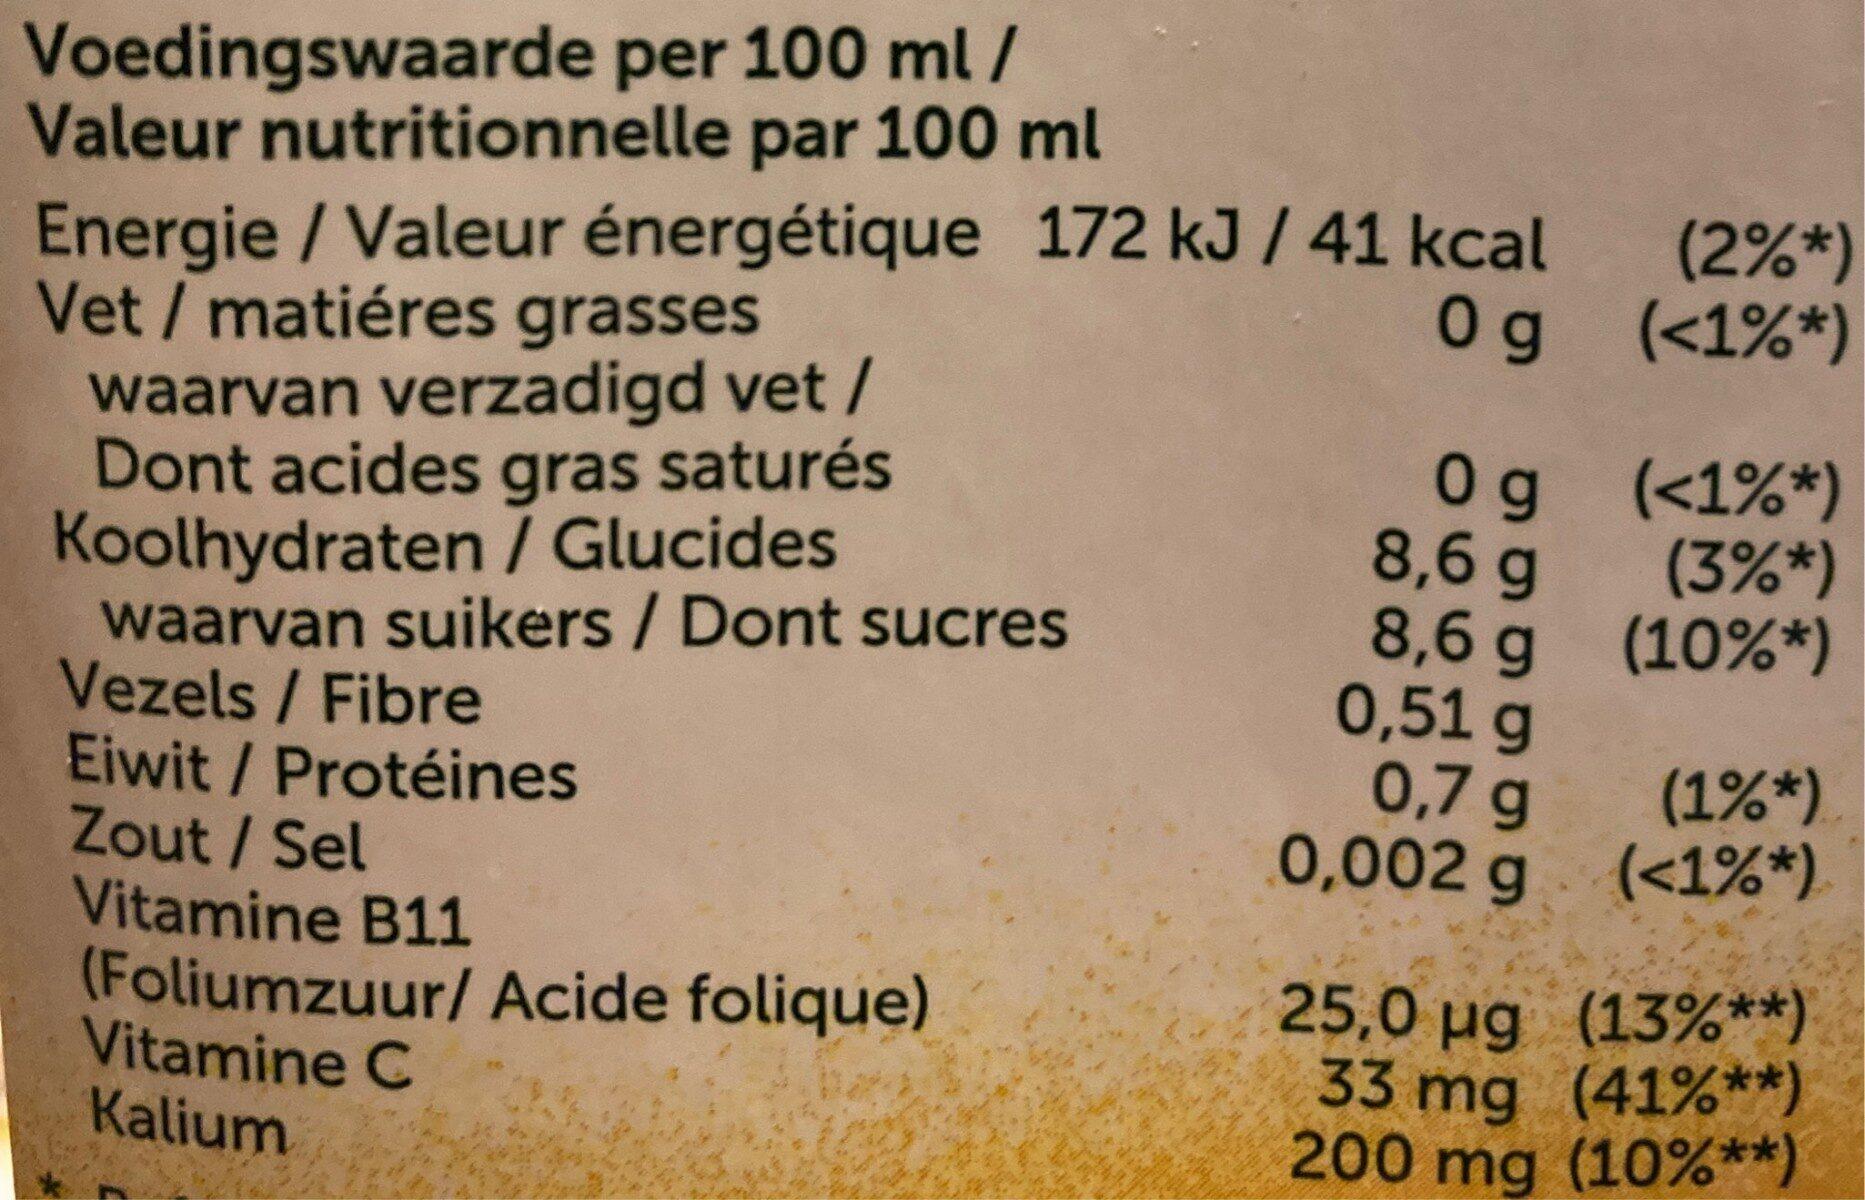 Jus d'orange  extra pulpe - Informations nutritionnelles